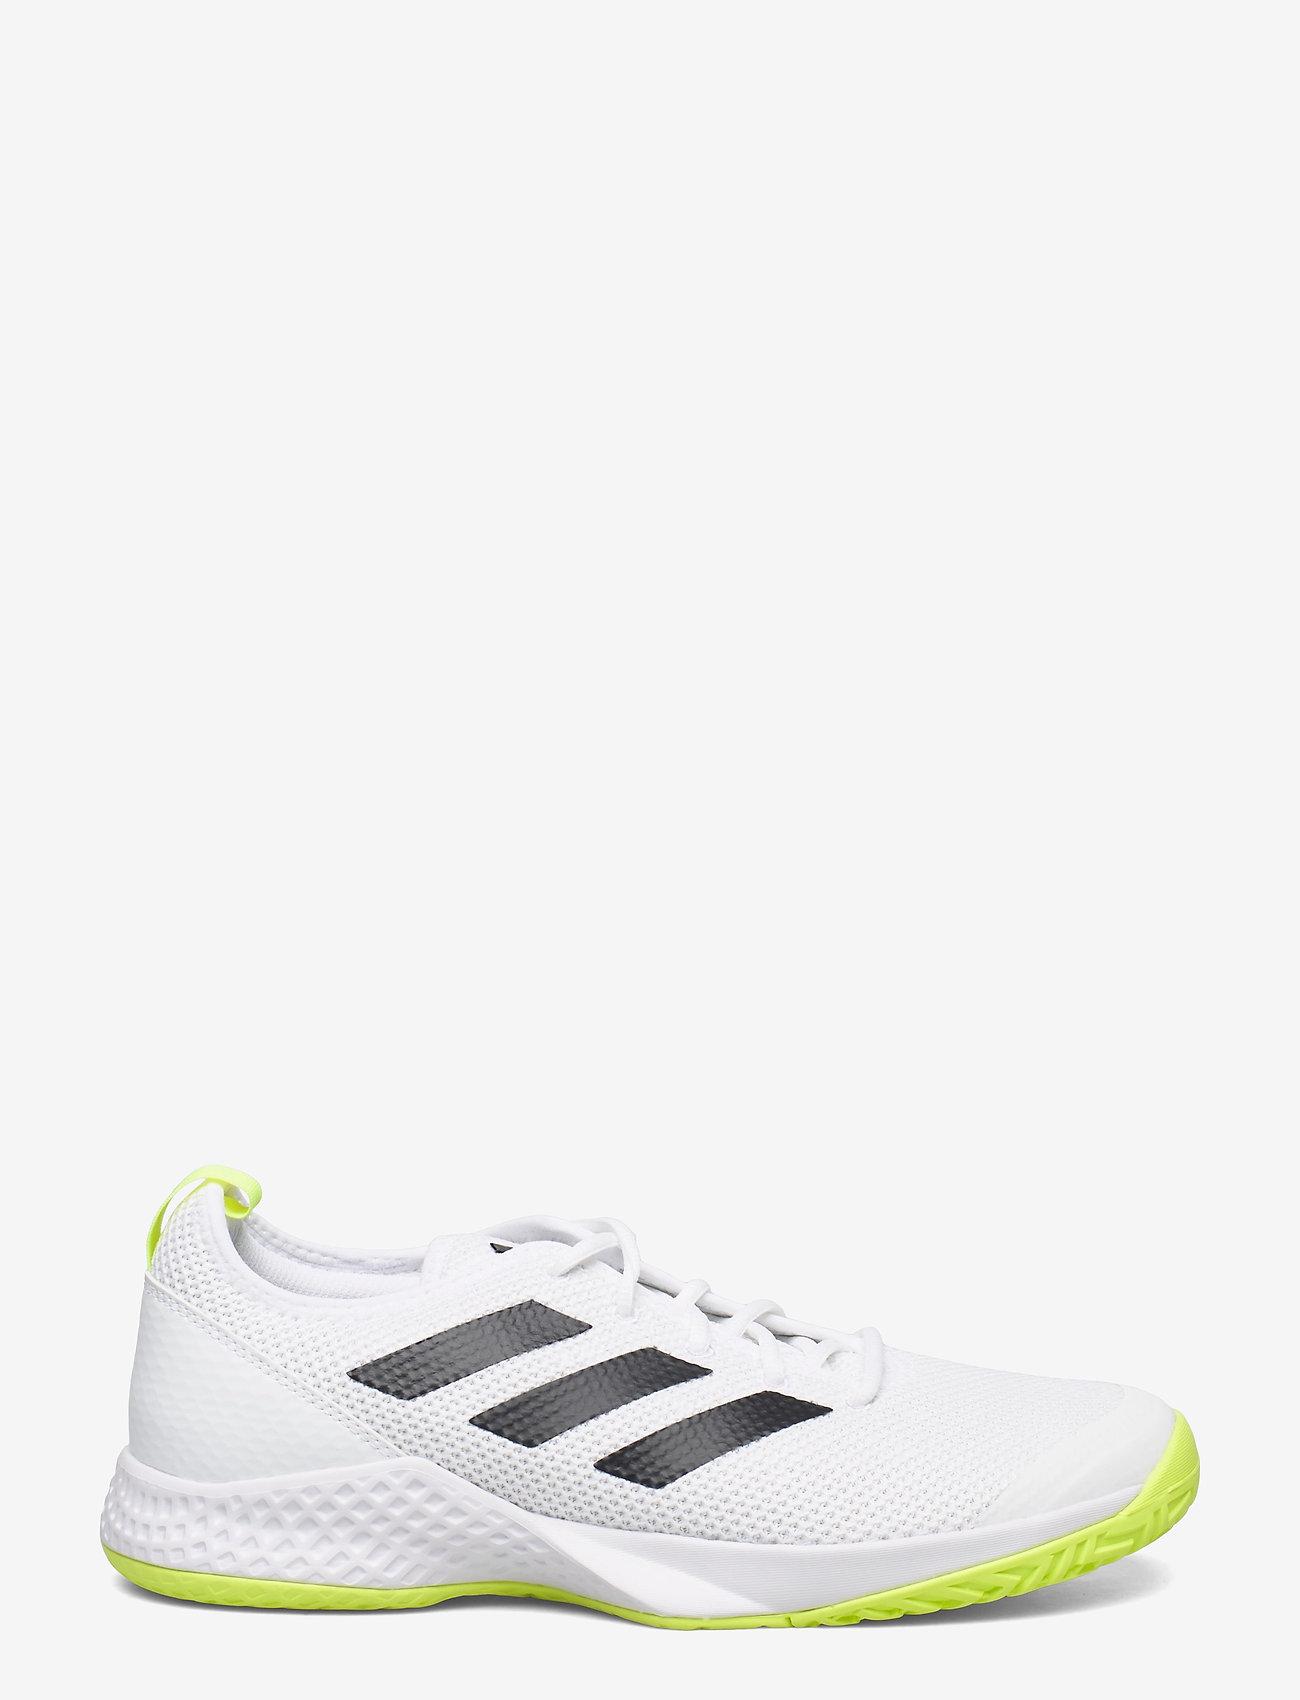 adidas Performance - COURT CONTROL M - ketsjersportsko - white - 1